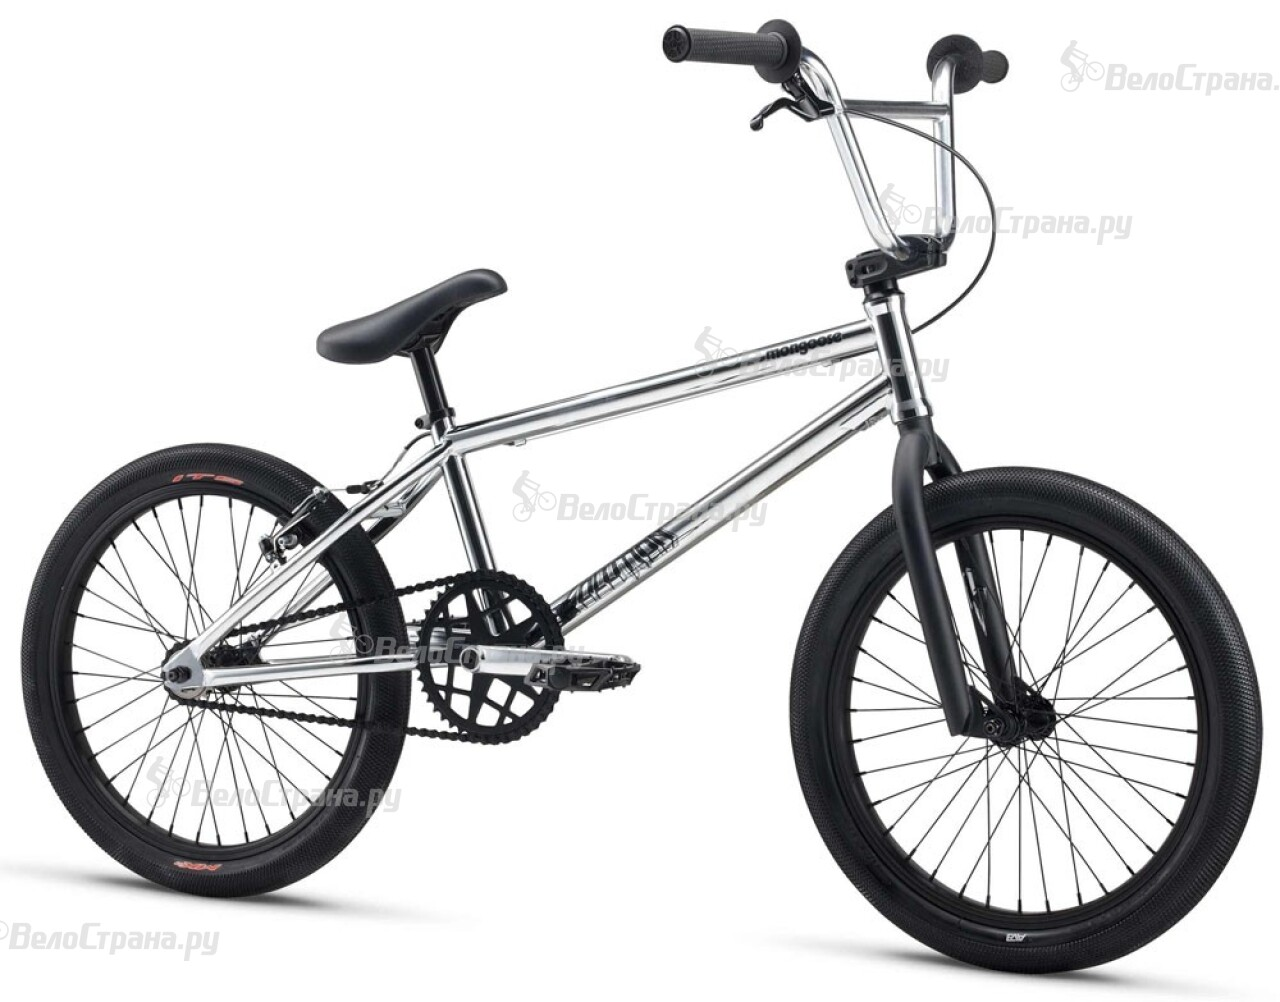 все цены на Велосипед Mongoose Ritual Street (2013) онлайн